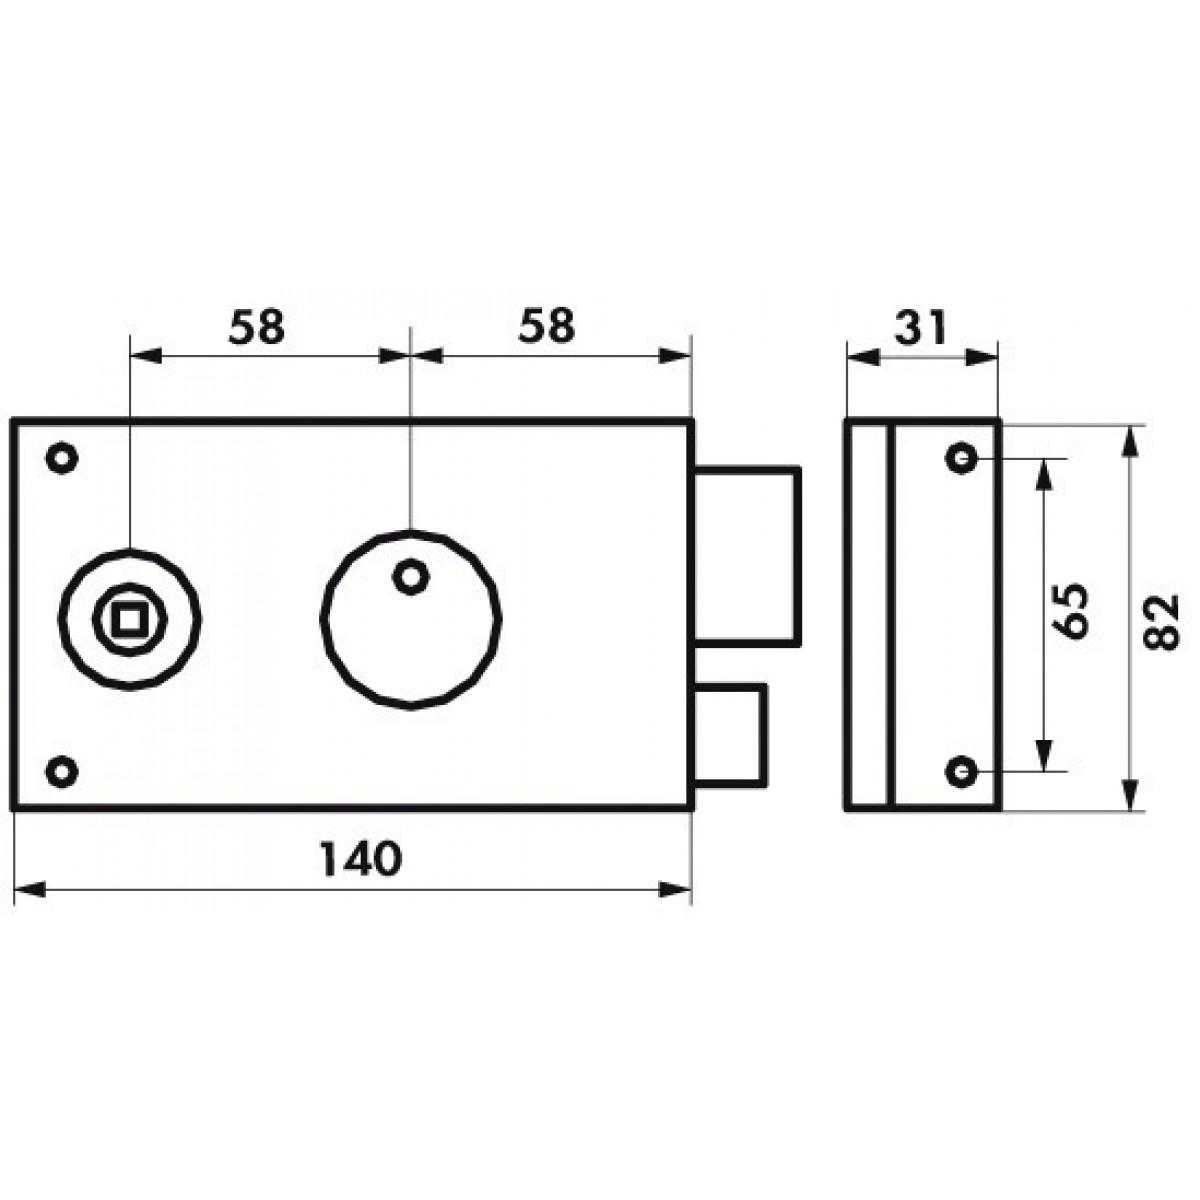 Serrure horizontale pêne dormant 1/2 T Thirard - Noir - Droite - l x h - 82 x 140 mm